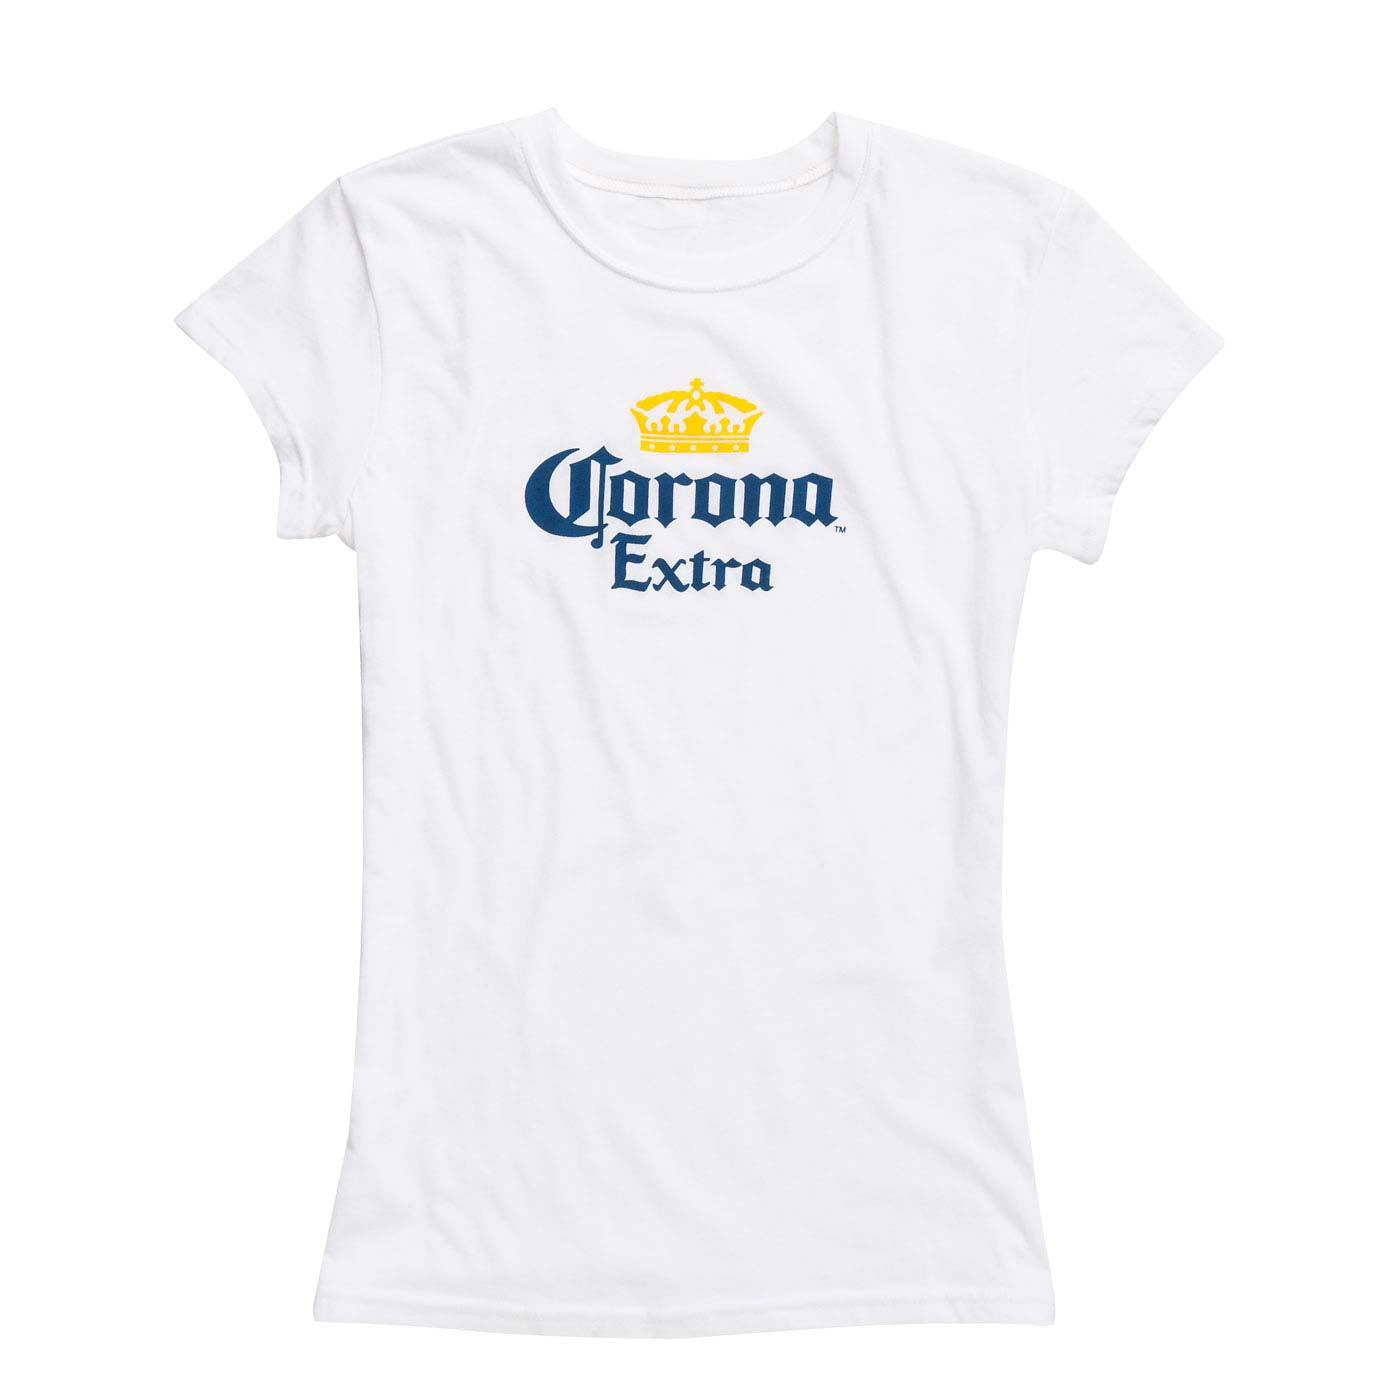 Corona Extra Ladies White Tee Shirt